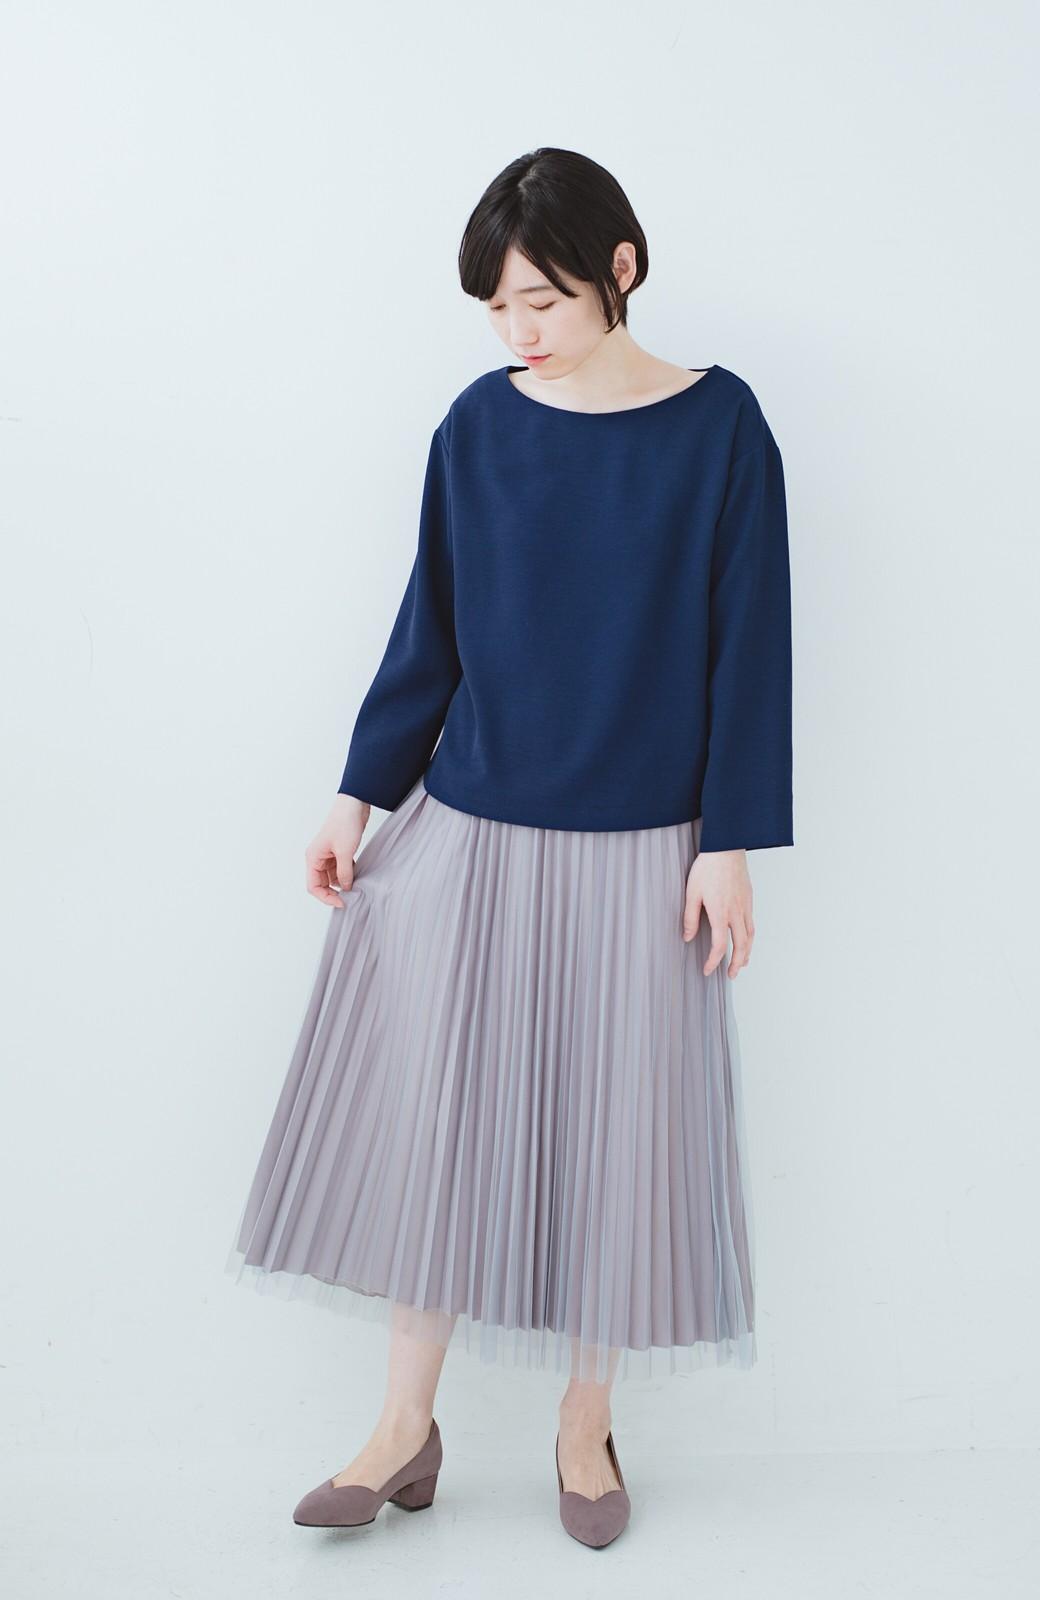 haco! どんな日も華やか気分にしてくれる 二枚仕立てのチュールプリーツスカート <ライトグレー>の商品写真11